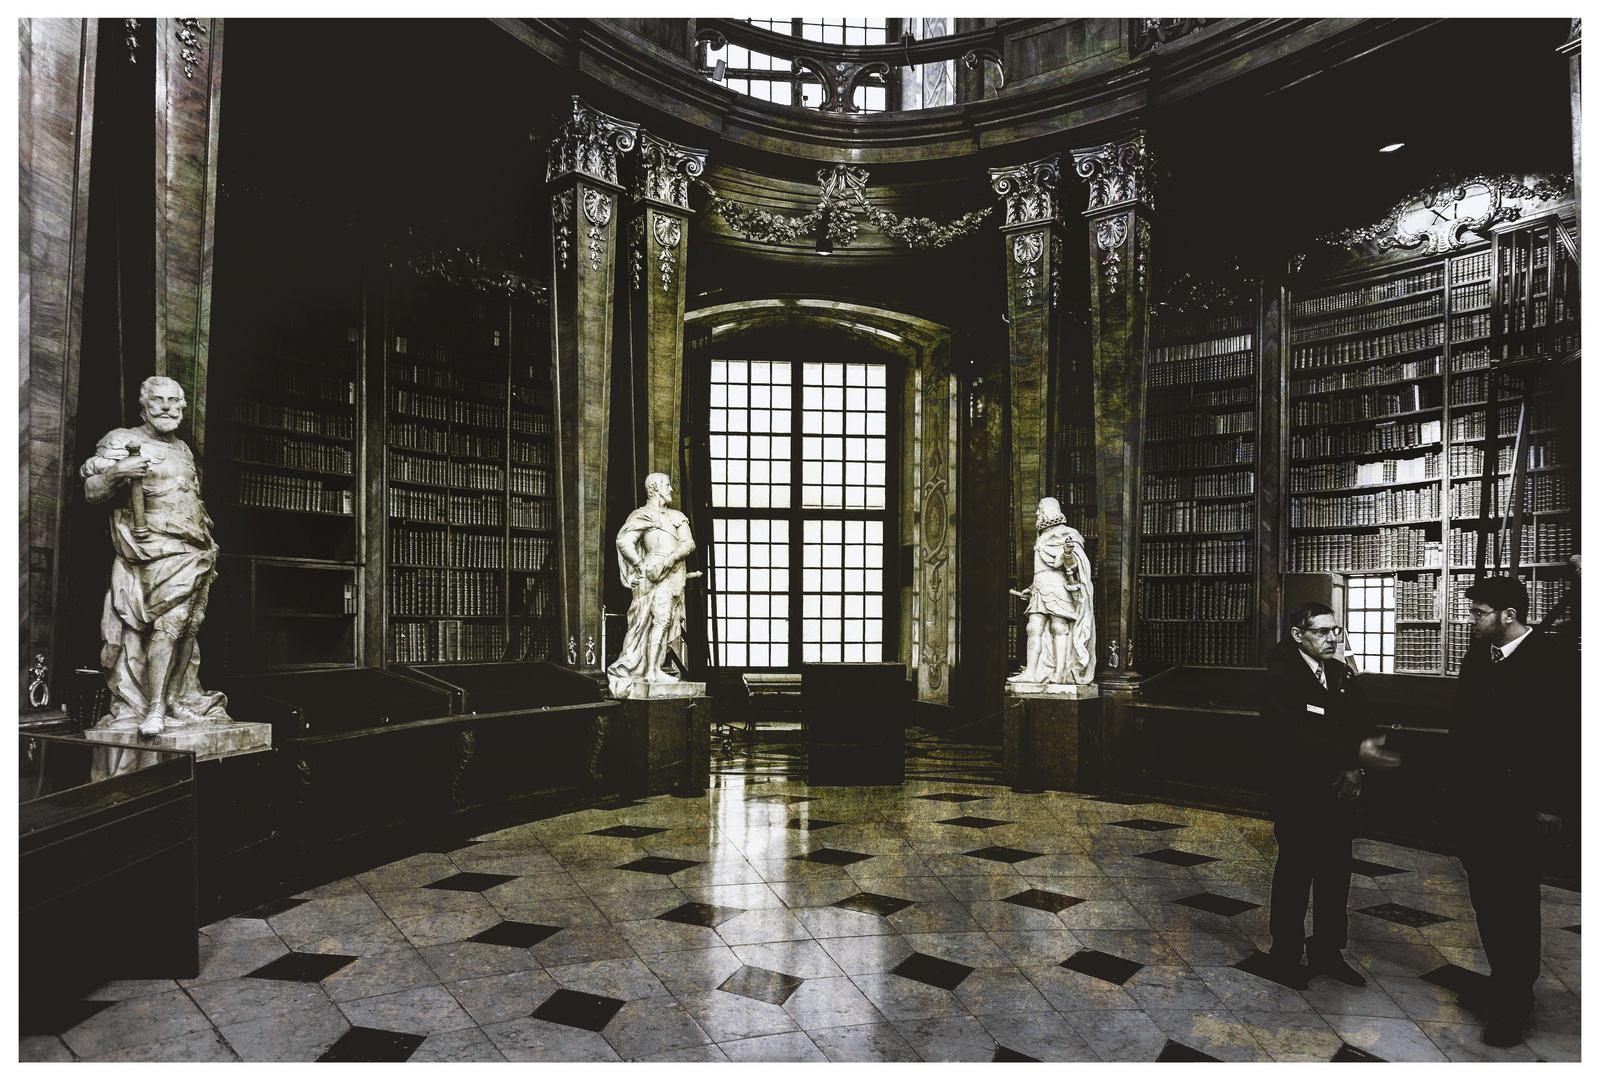 Bibliotheks-Wächter ...